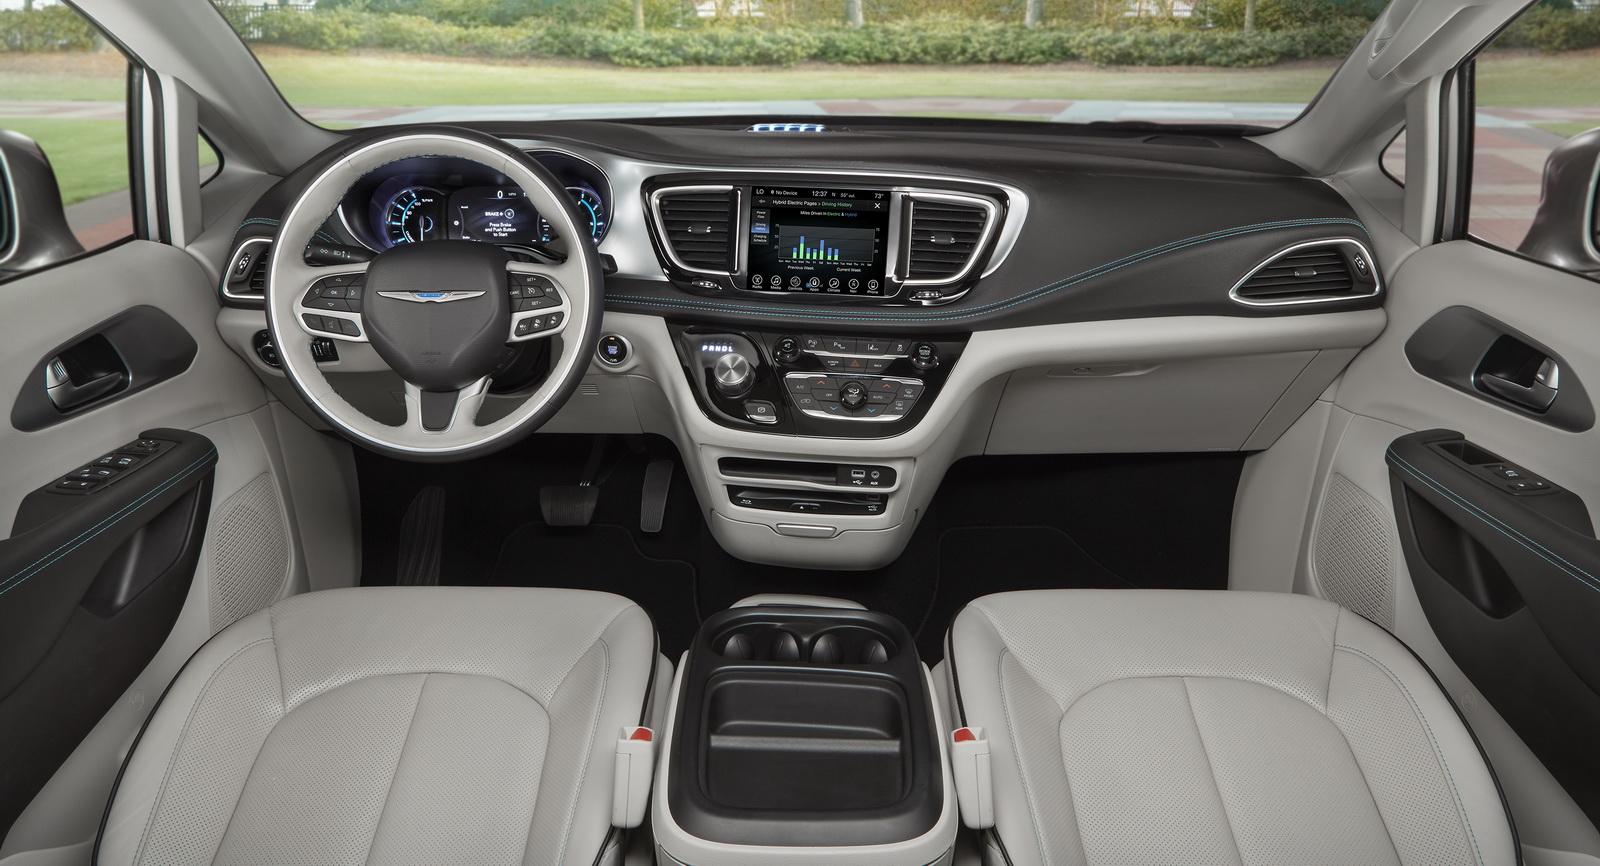 Chrysler Details 2017 Pacifica Hybrid Minivan, Gets Remote